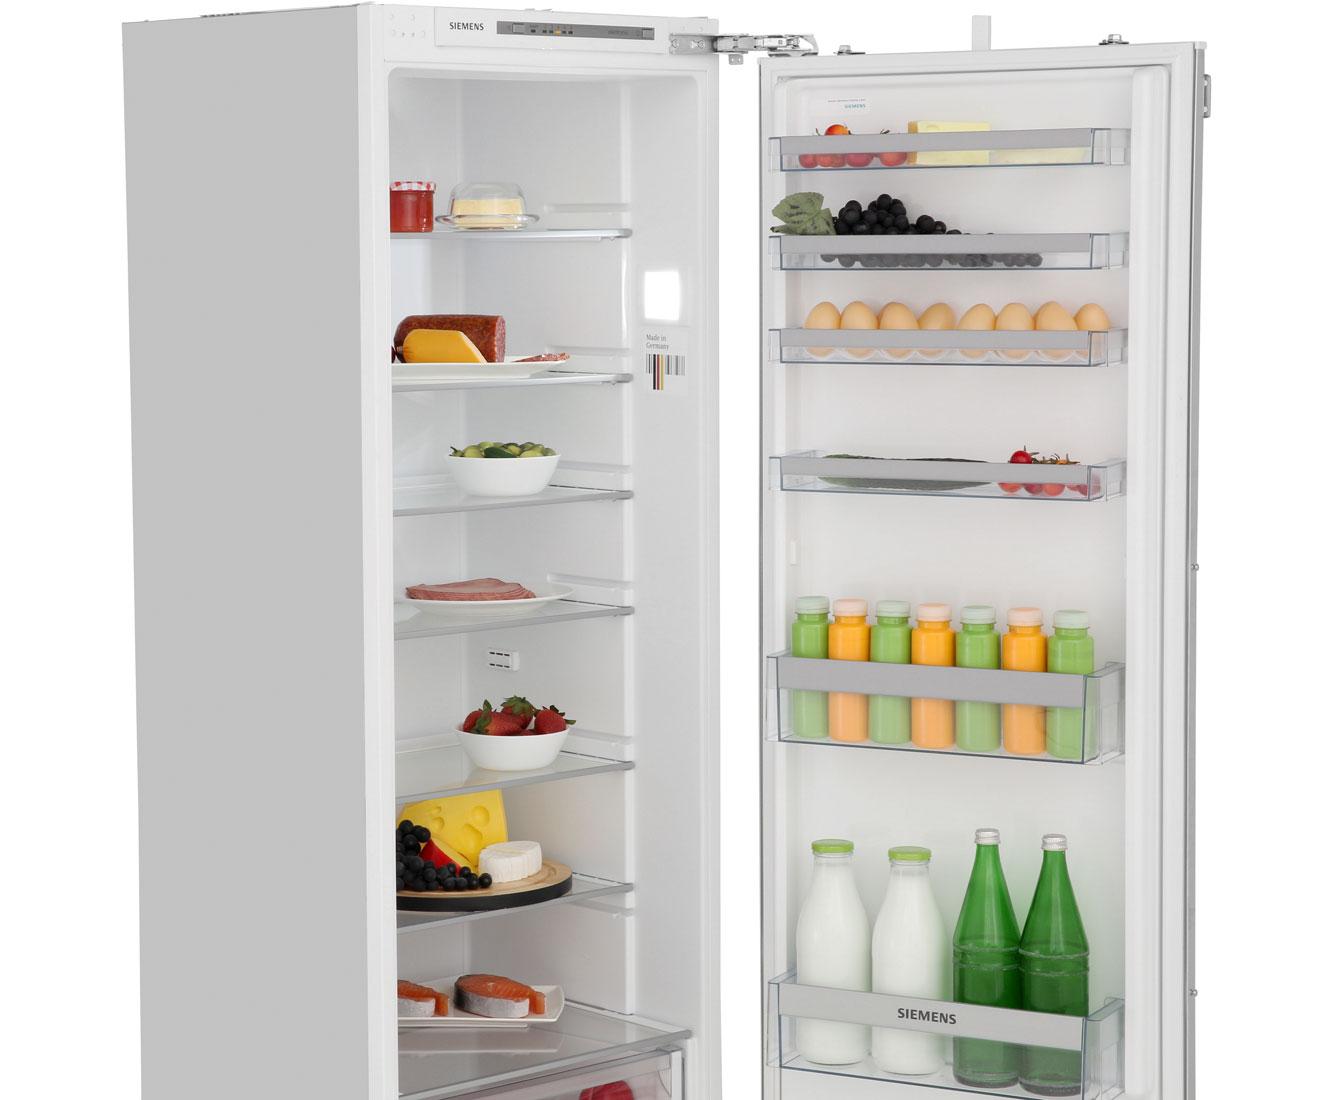 Siemens Kühlschrank Groß : Siemens ki81rvf30 einbau kühlschrank 178er nische festtür technik